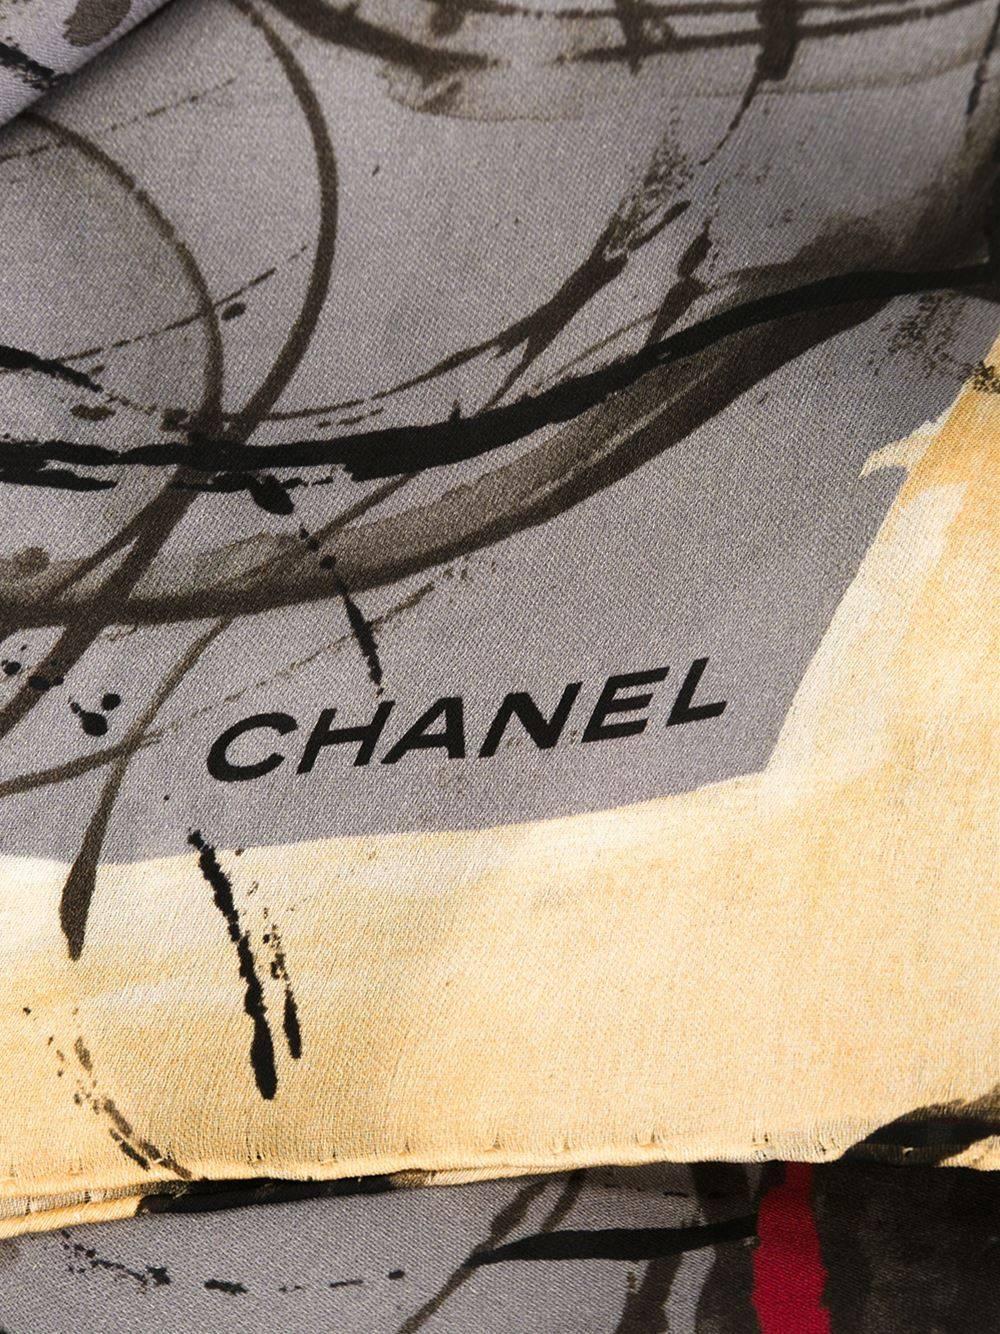 Chanel Print Art: Chanel Abstract Print Scarf At 1stdibs